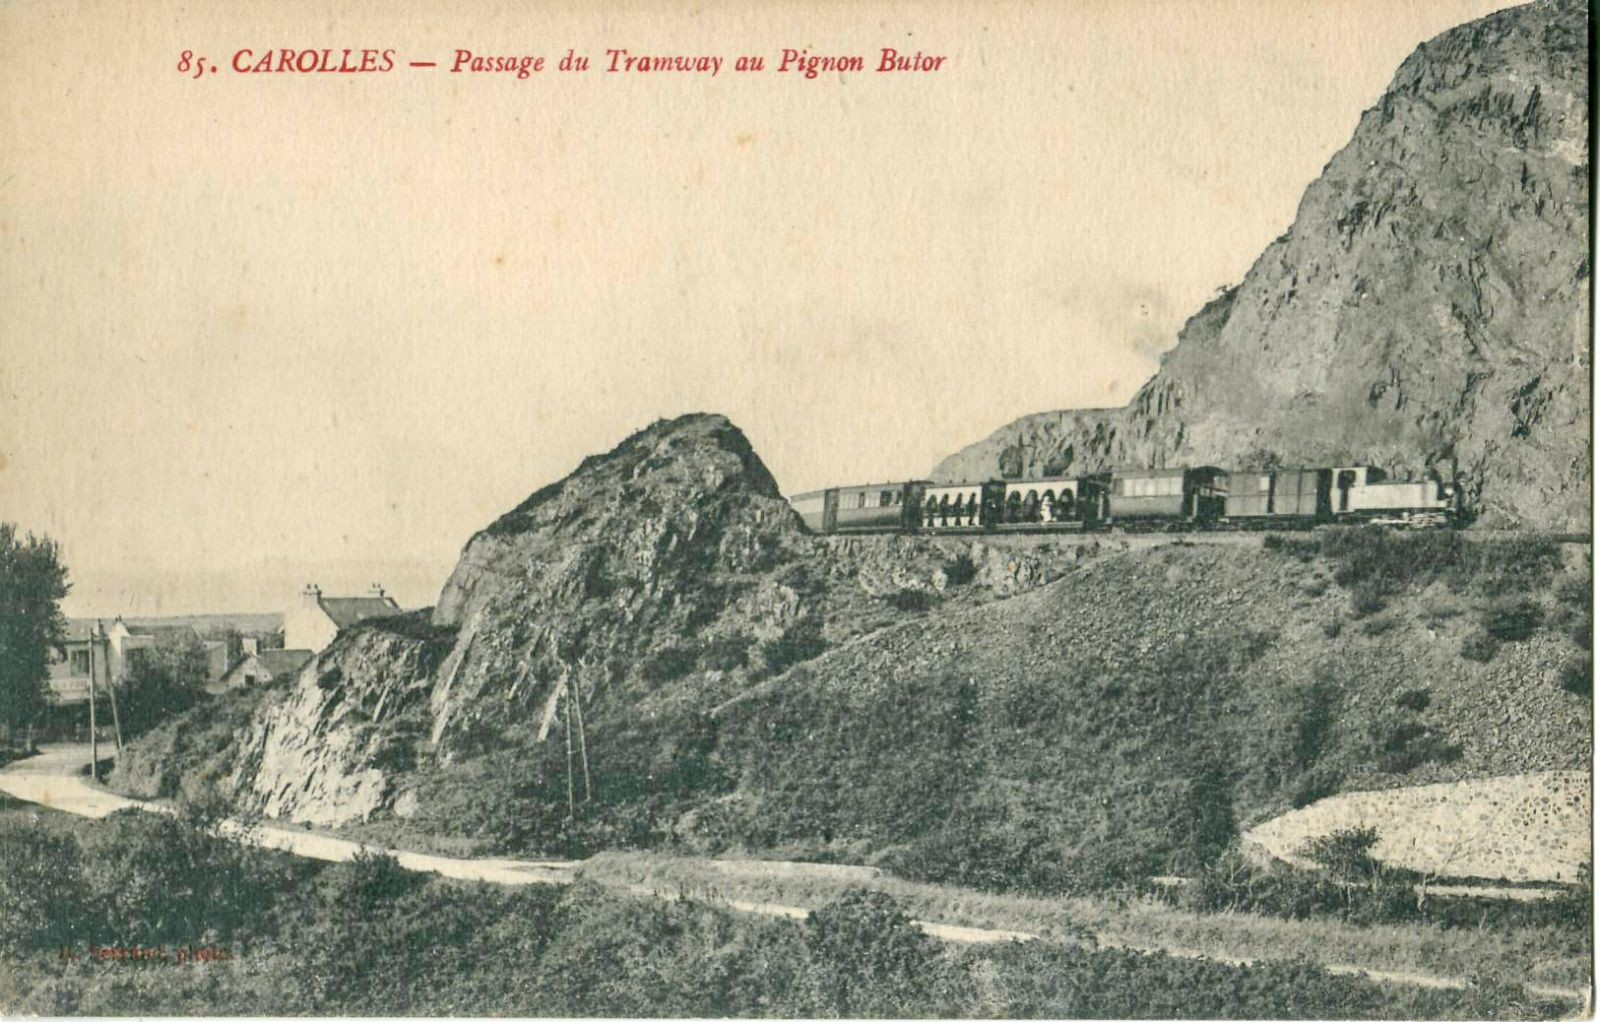 Passage au Pignon Butor